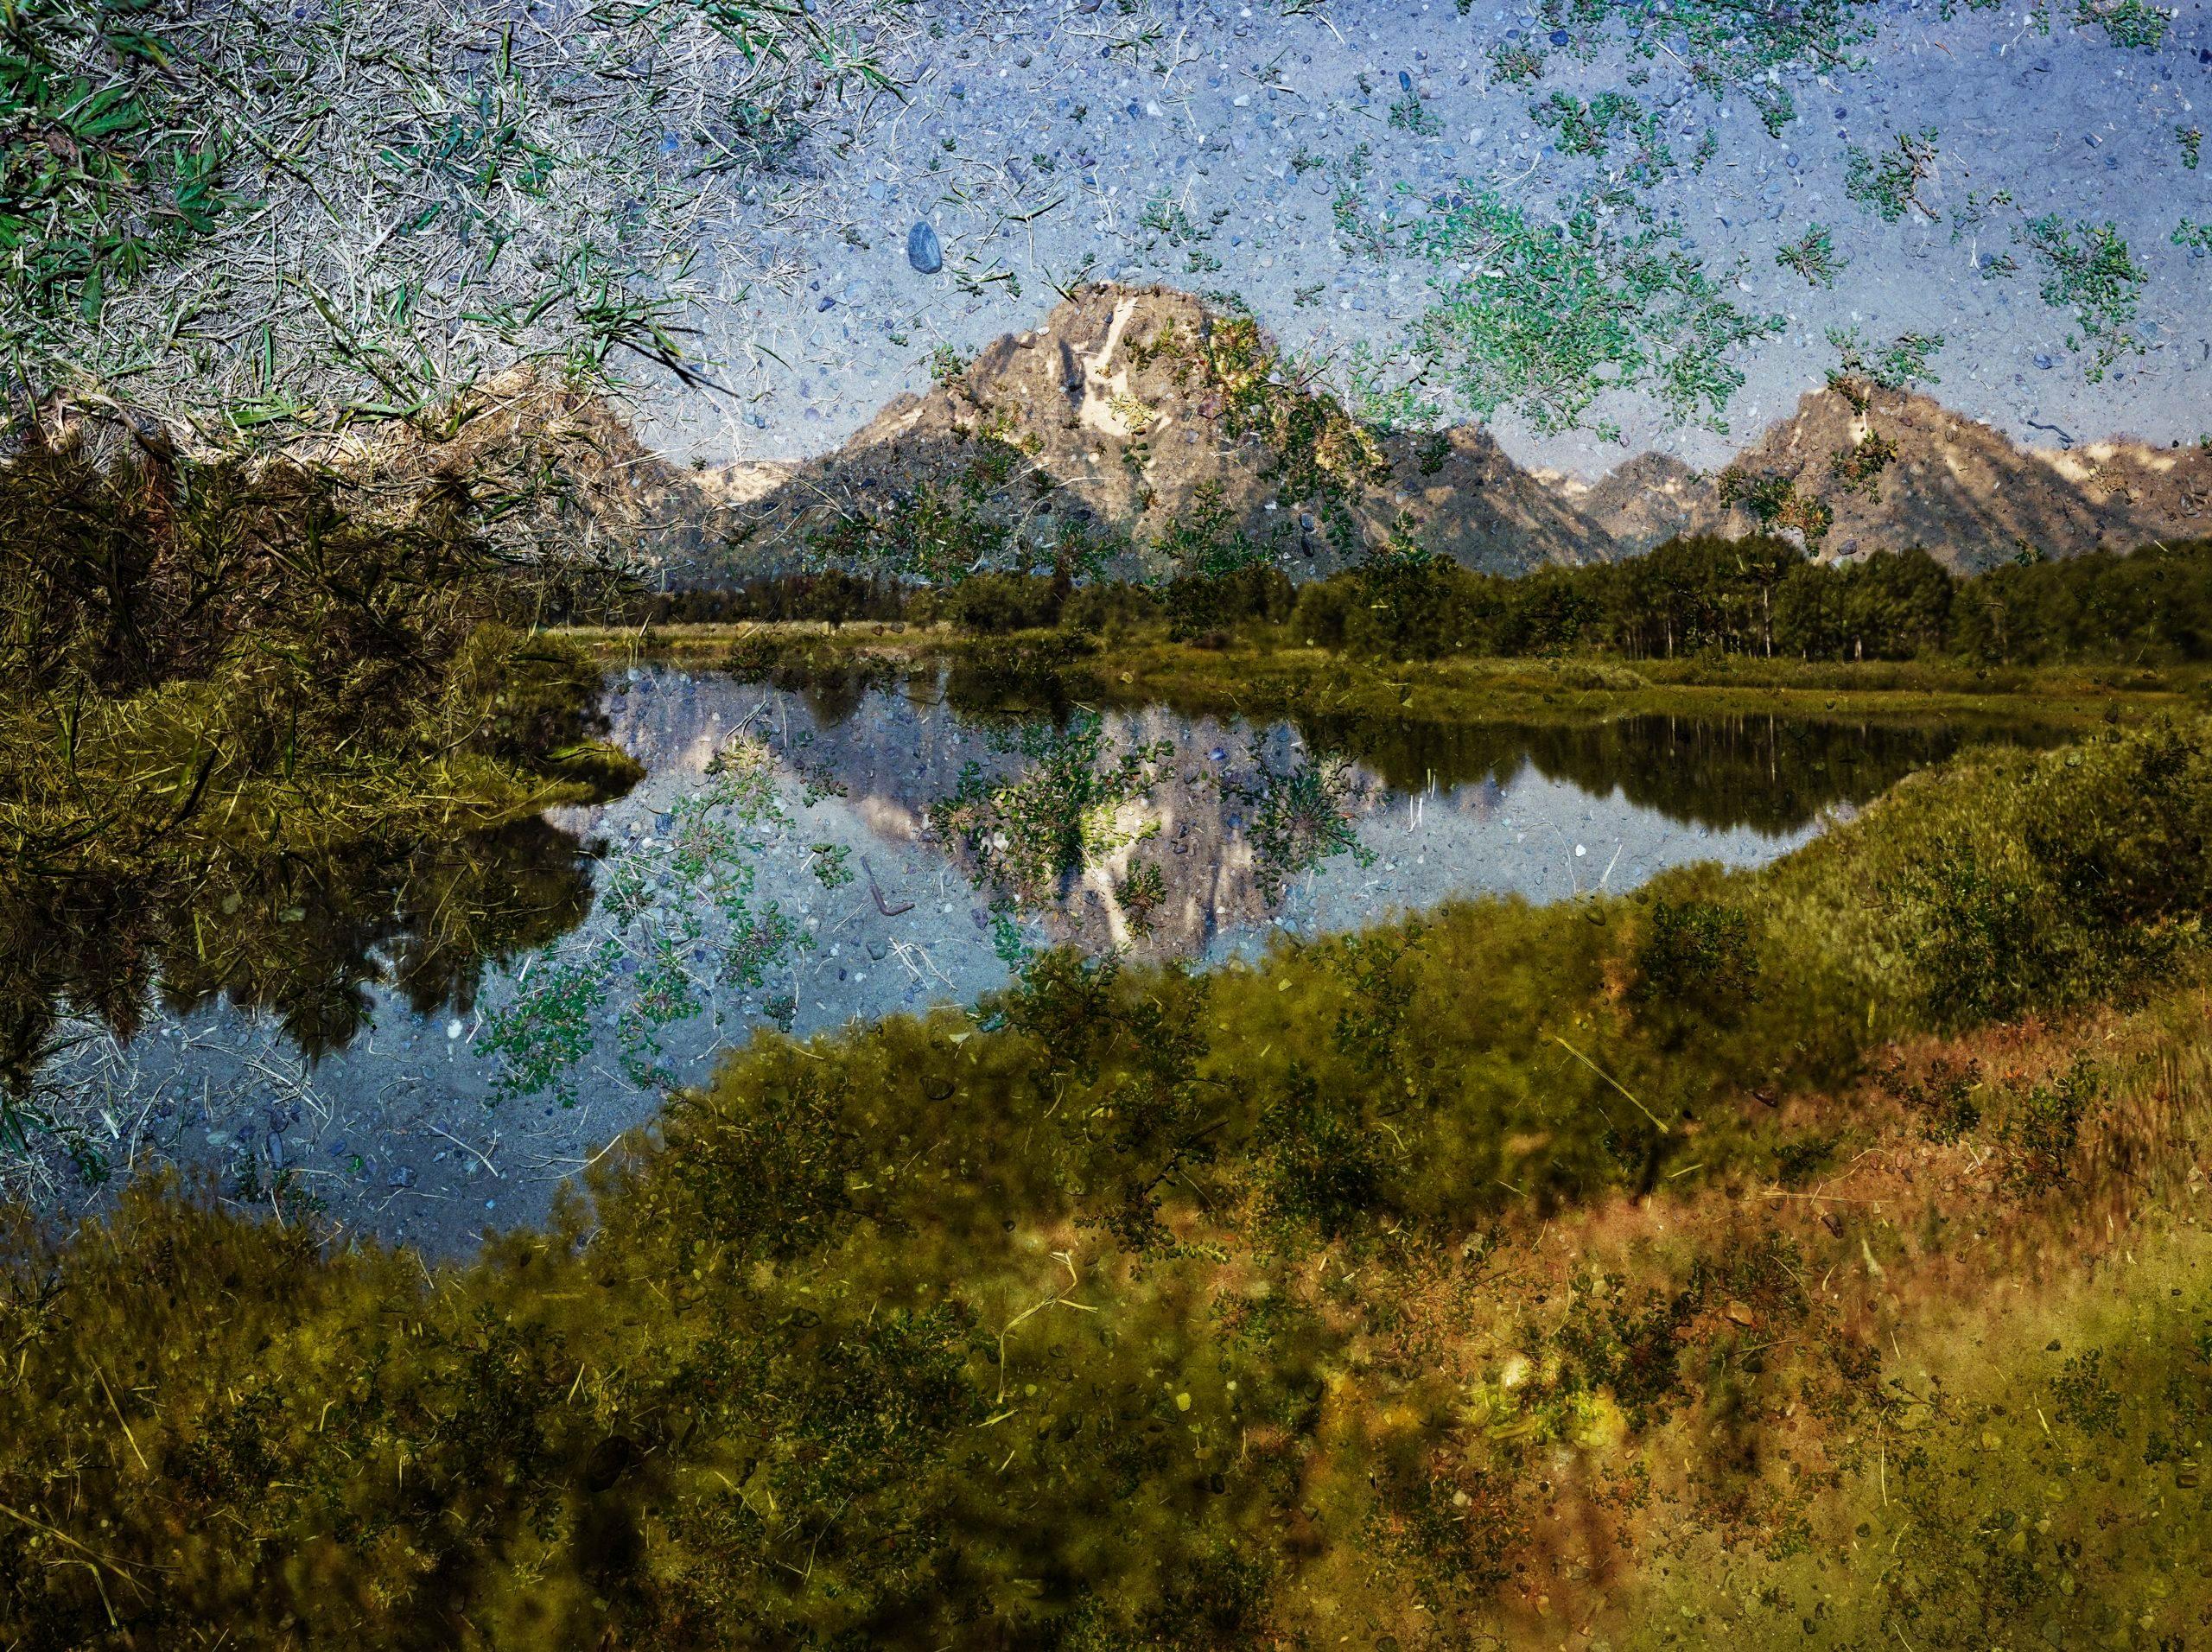 <em>Tent-Camera Image on Ground: View of Mount Moran and the Snake River from Oxbow Bend, Grand Teton National Park,Wyoming</em>, Abelardo Morell (American (born in Cuba, 1948)), 2011, Photograph, inkjet print, Abelardo Morell │Courtesy of Edwynn Houk Gallery, Courtesy, Museum of Fine Arts, Boston